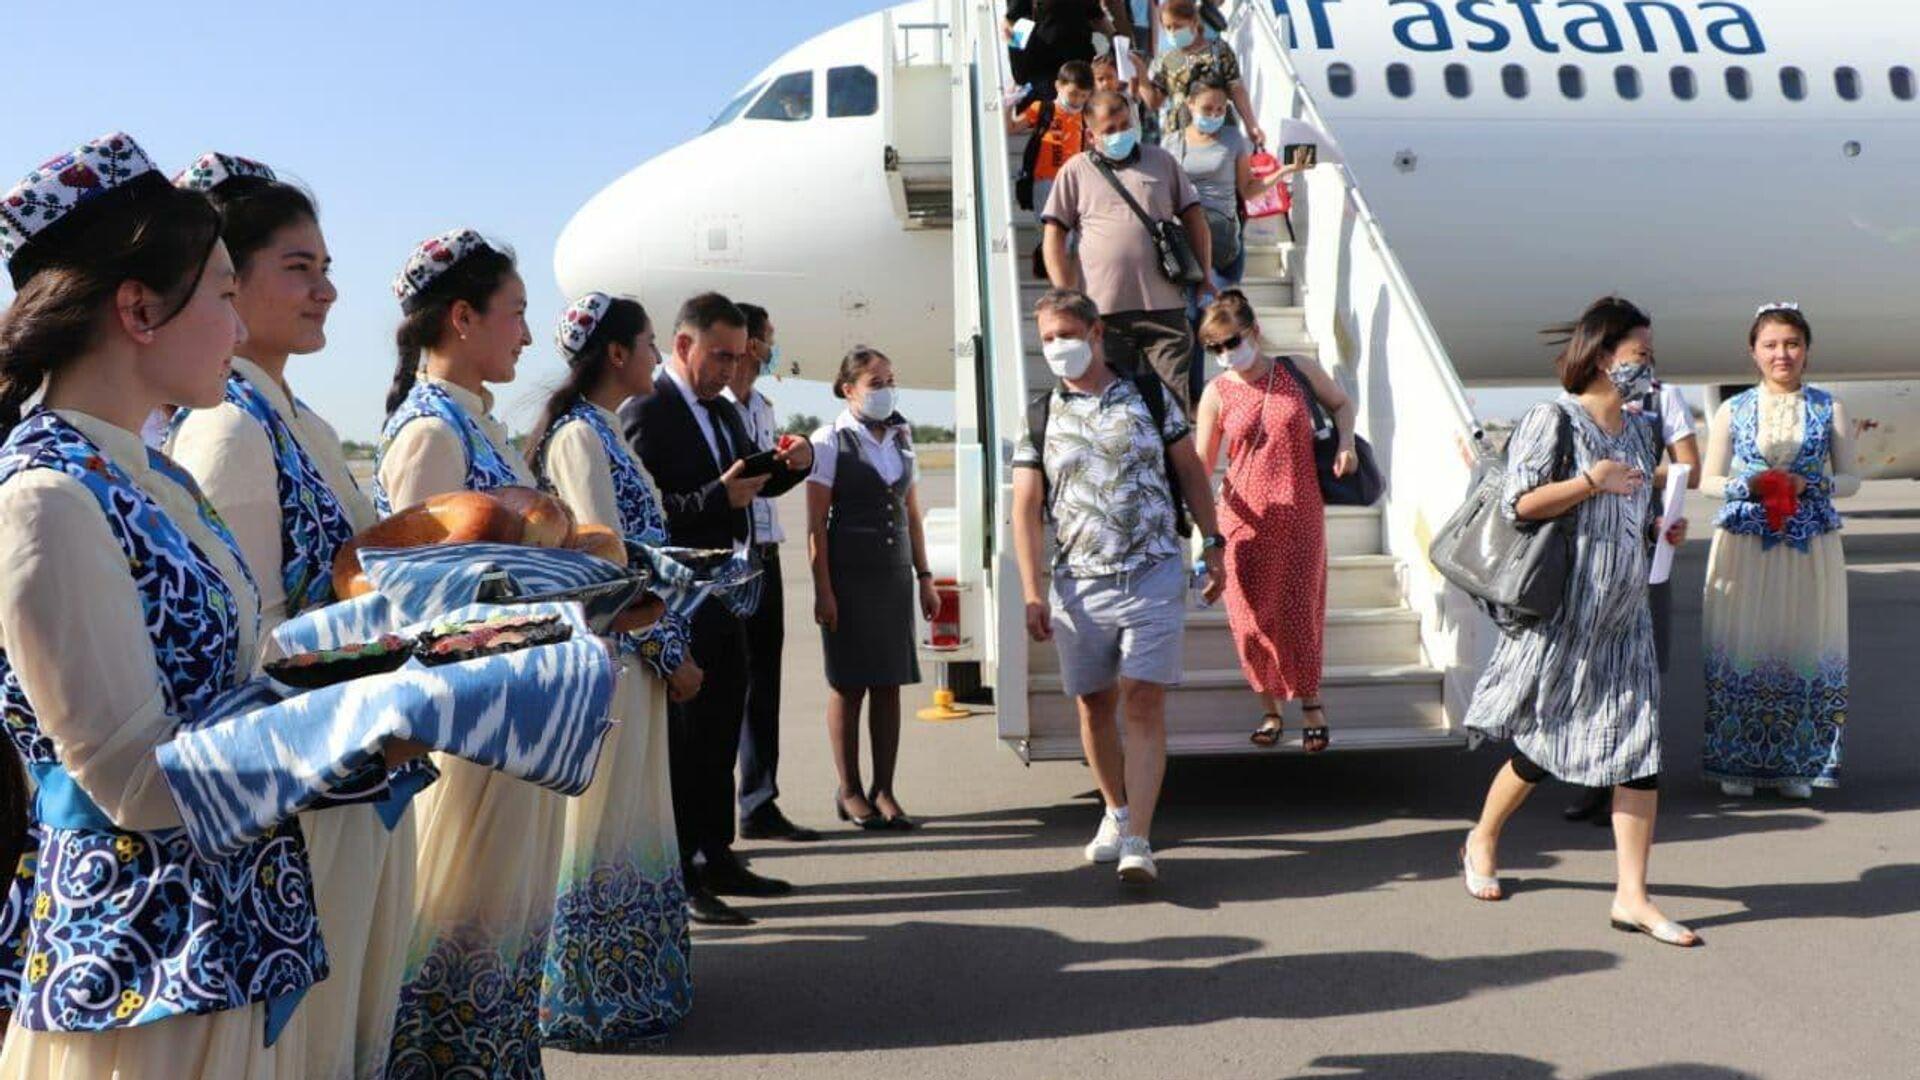 Встреча самолета Air Astana в аэропорту Самарканда - Sputnik Узбекистан, 1920, 09.06.2021